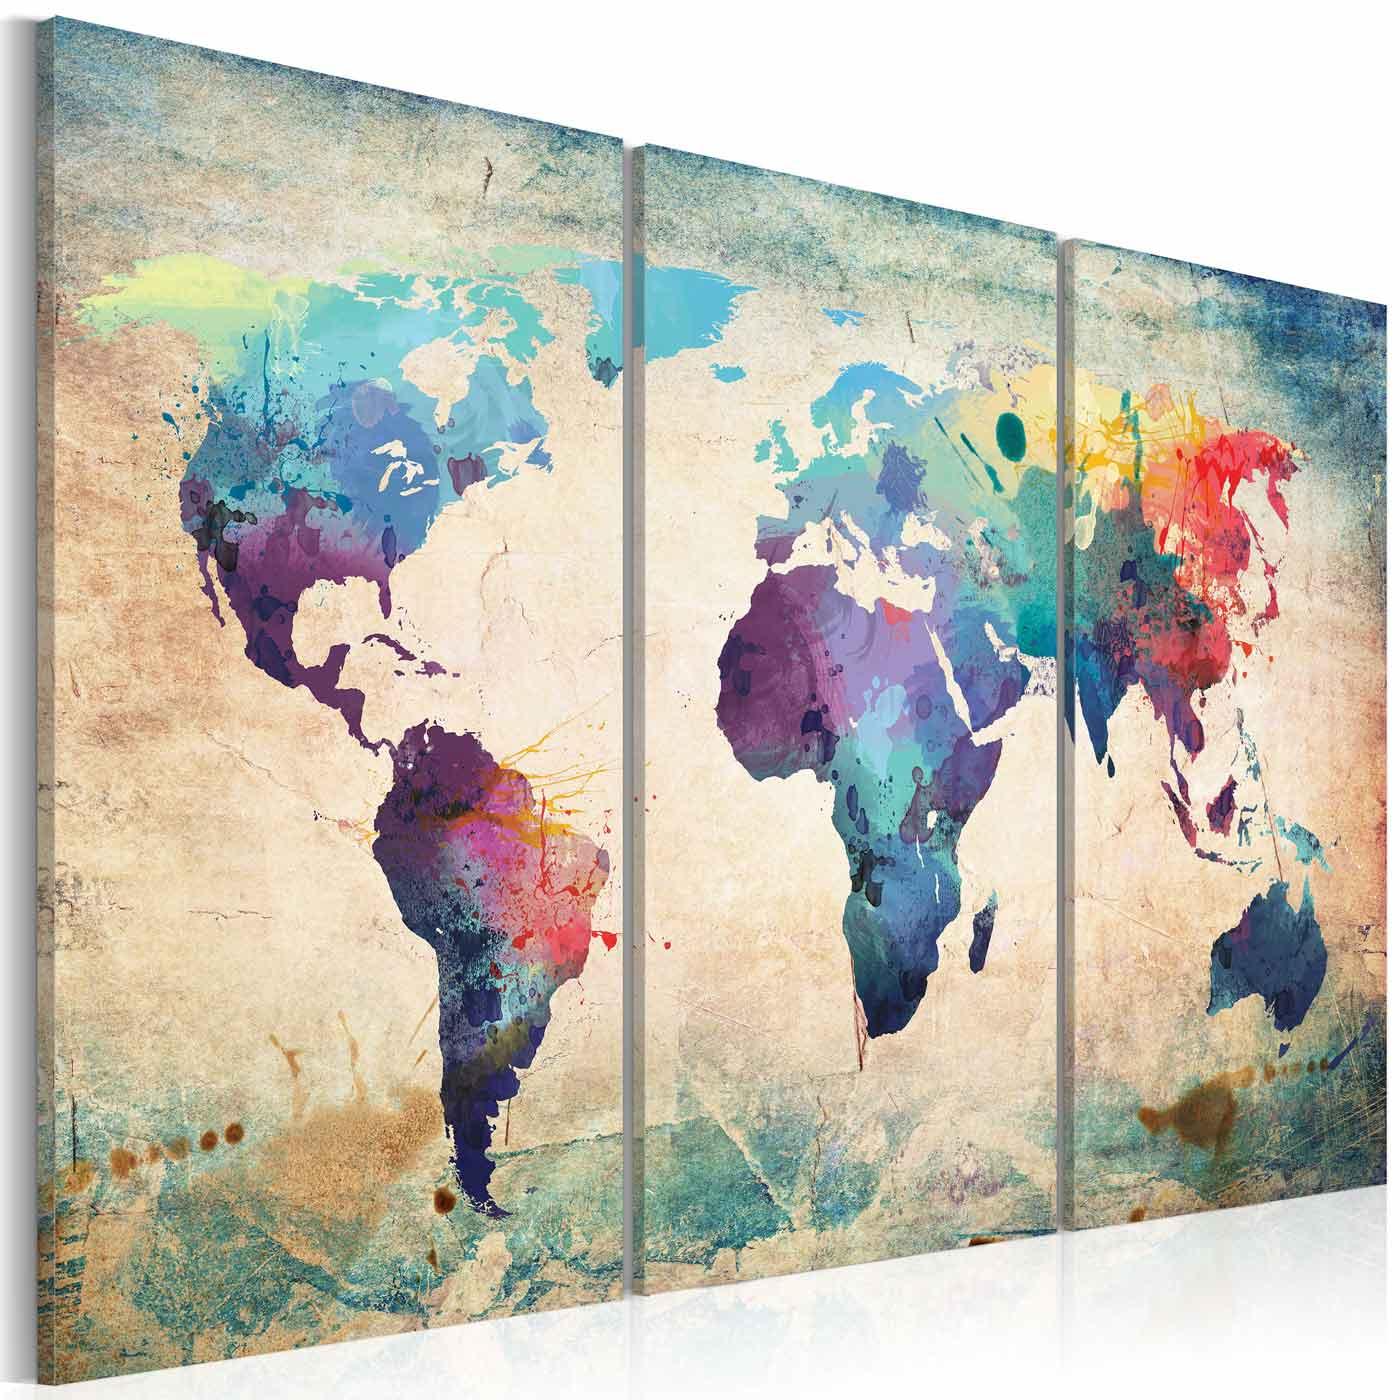 ARTGEIST Rainbow Triptych billede - multifarvet print, 2 størrelser 60x40